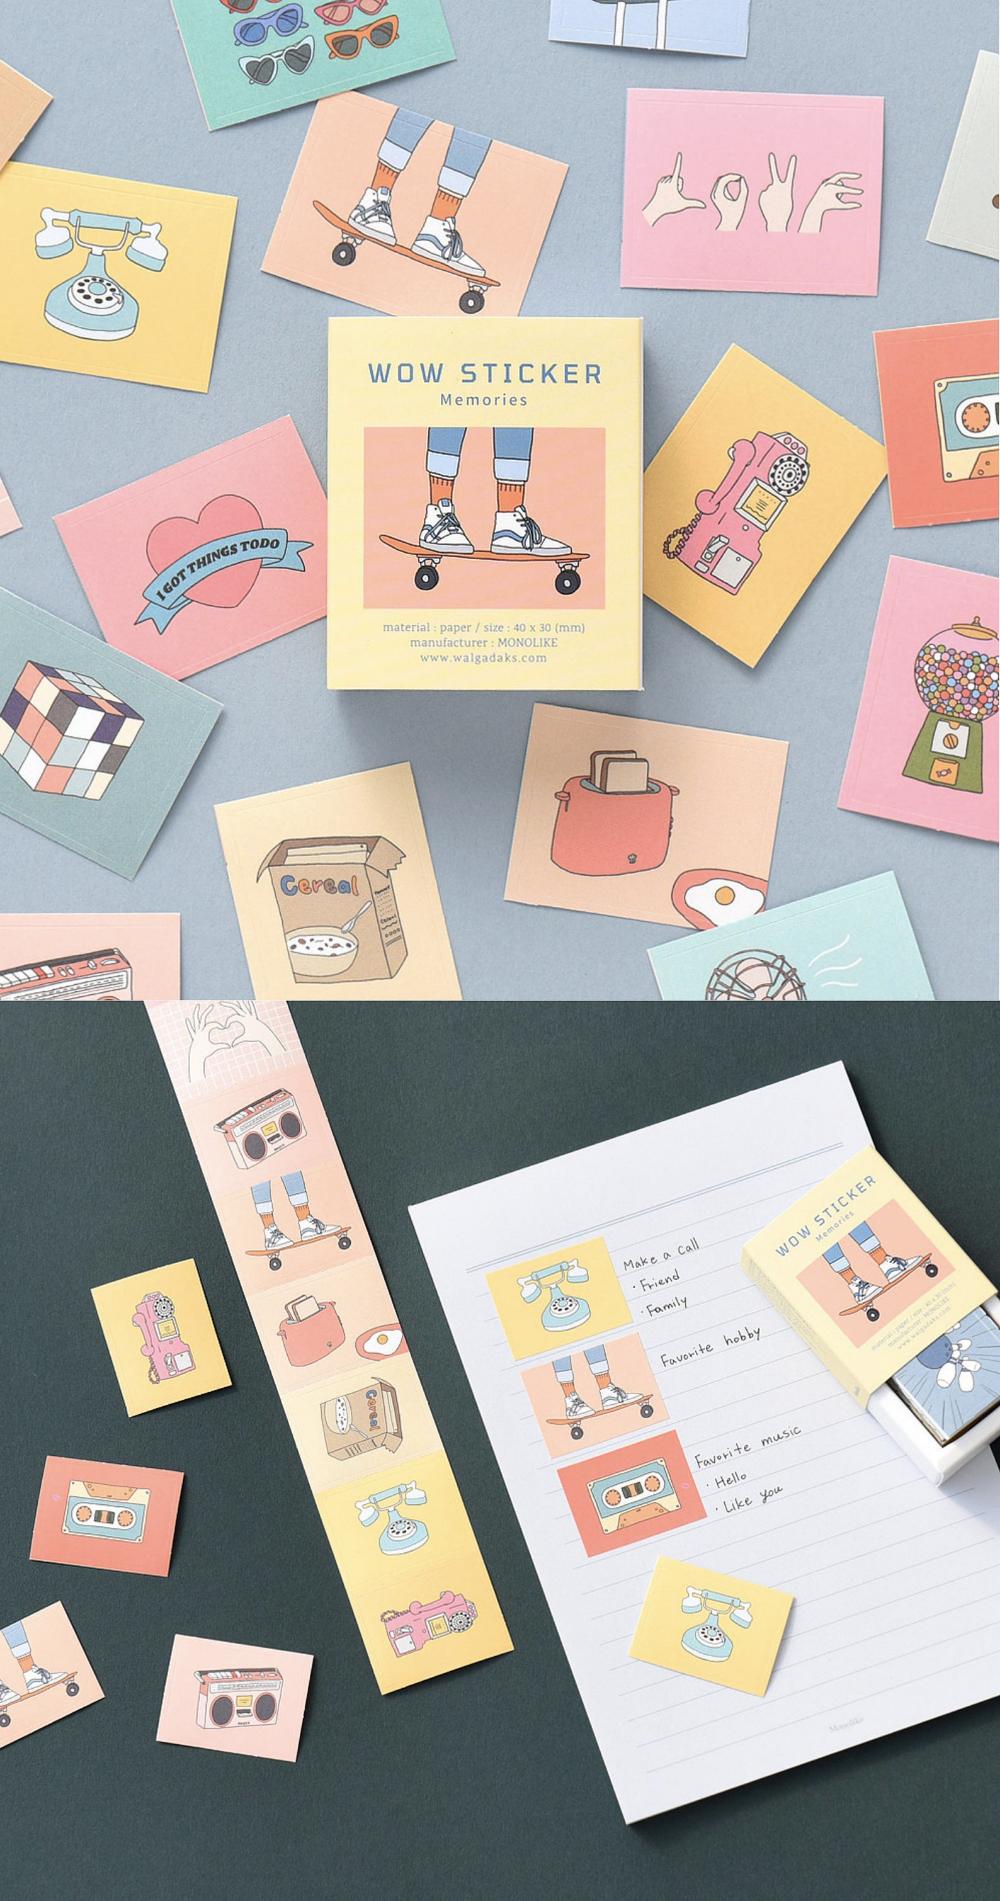 22 WOW SCRAPBOOKING STICKER | Stickers for Planner